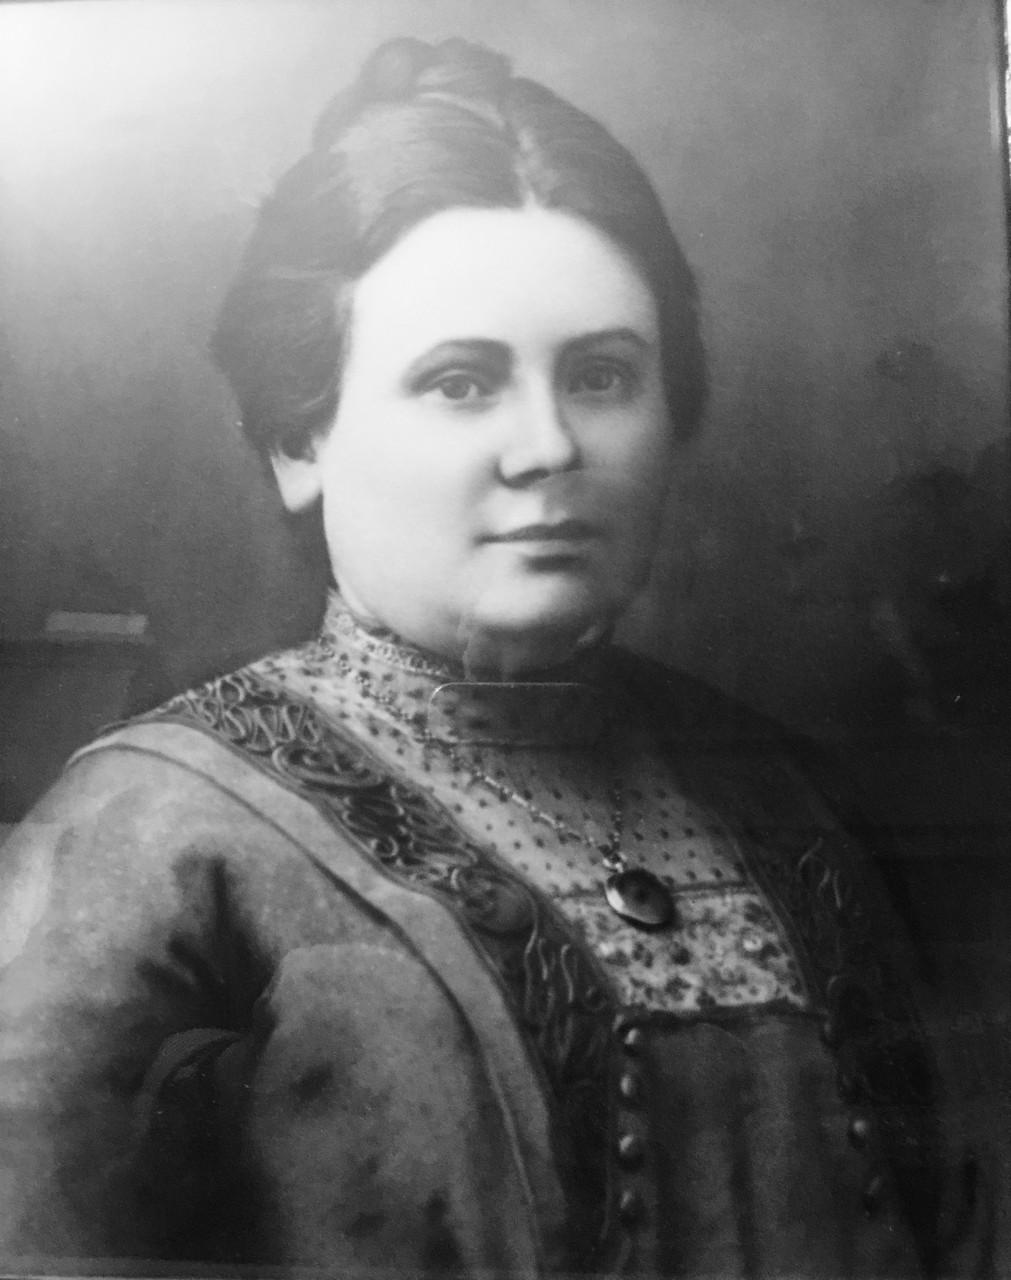 Emilie Kress